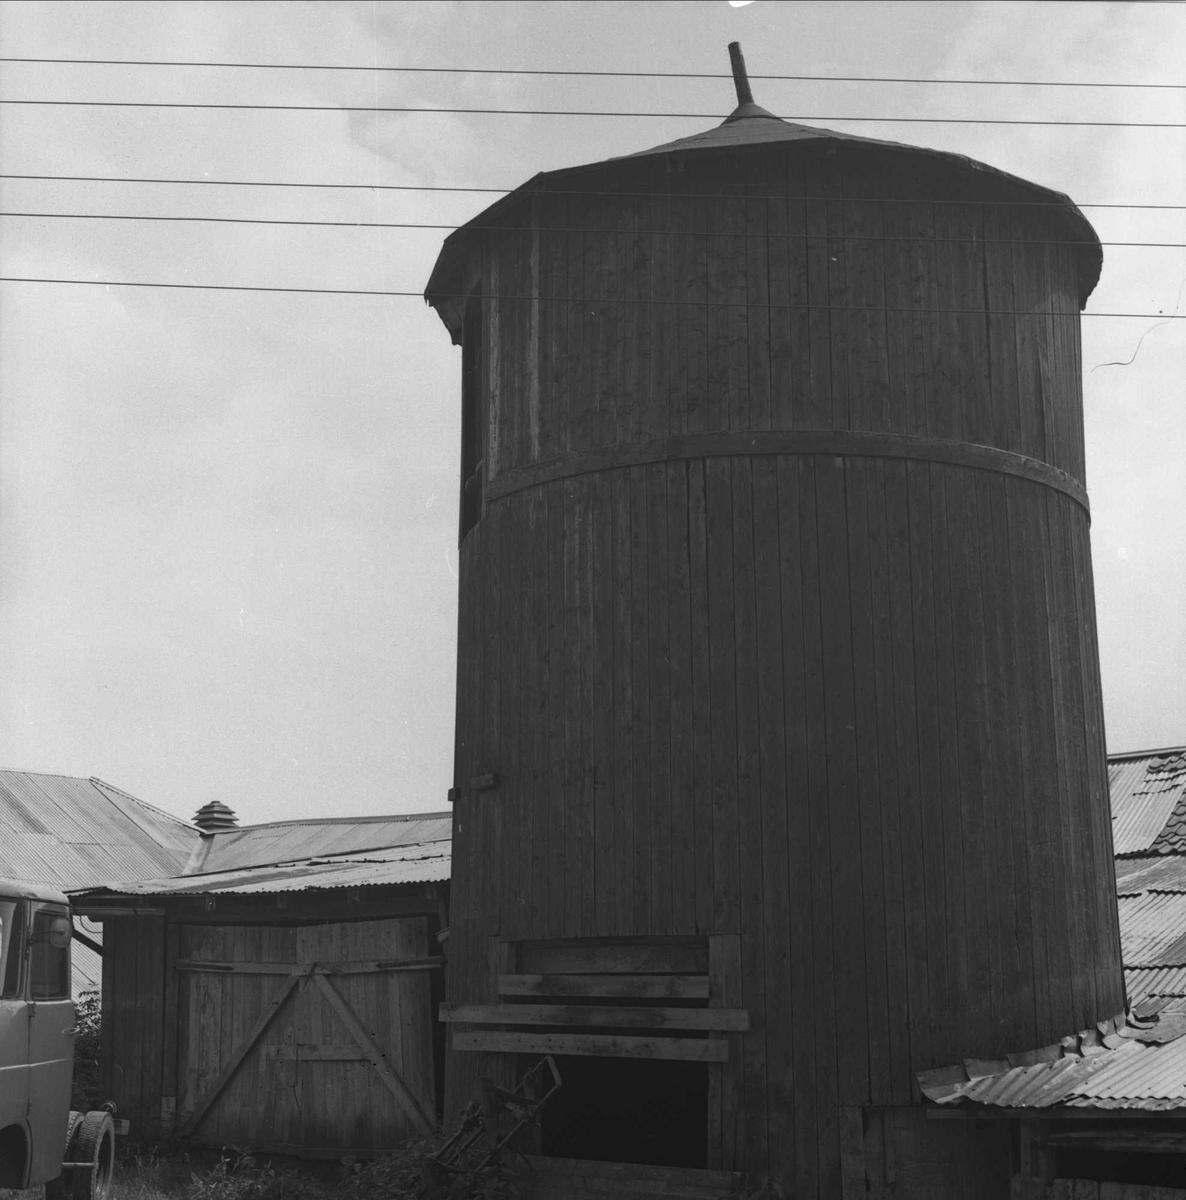 DOK:1980, låve, silo,